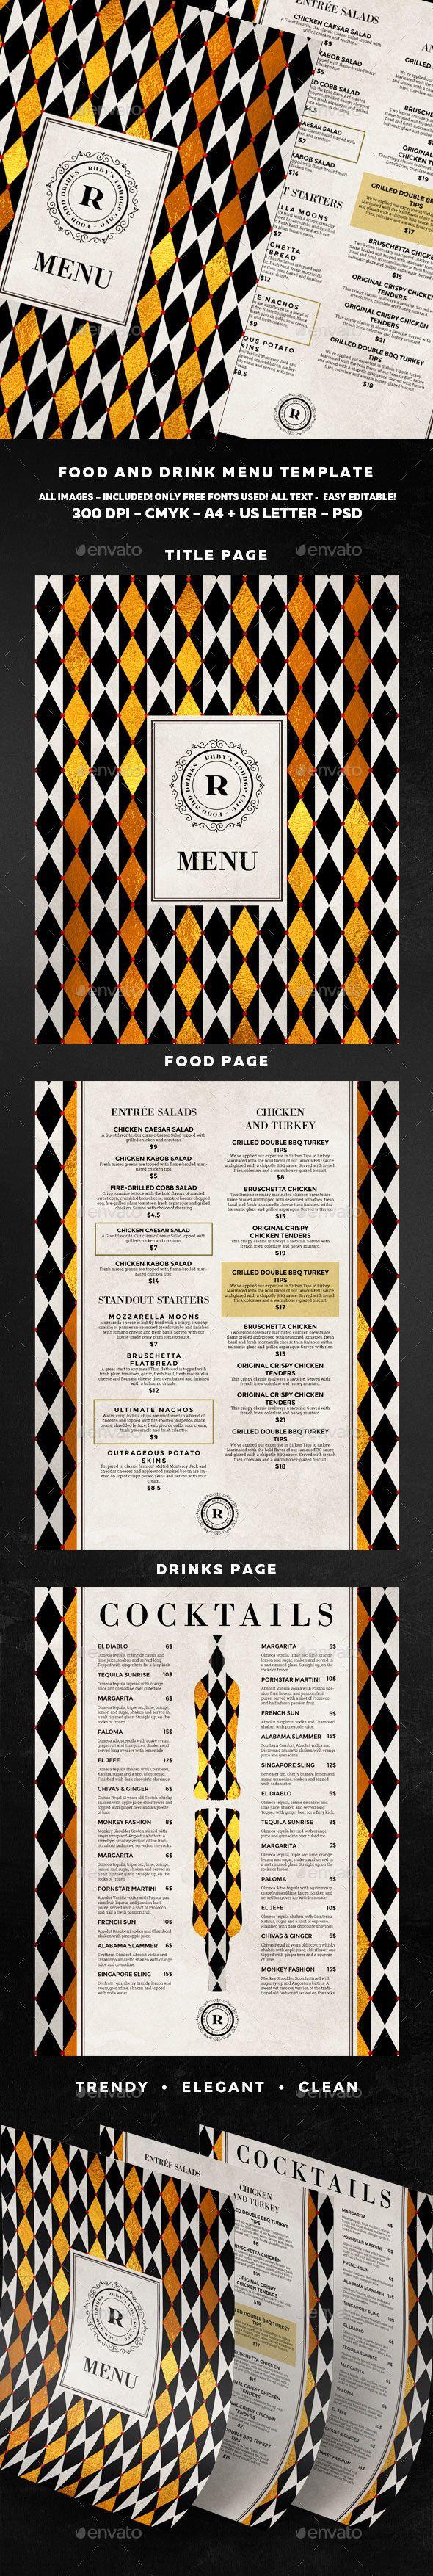 Food Menu #bar #cafe #clean #dinner #drink #elegant #fastfood #flyer #food #foodmenu #loft #menu #menudesign #modern #printtemplate #restaurant #template